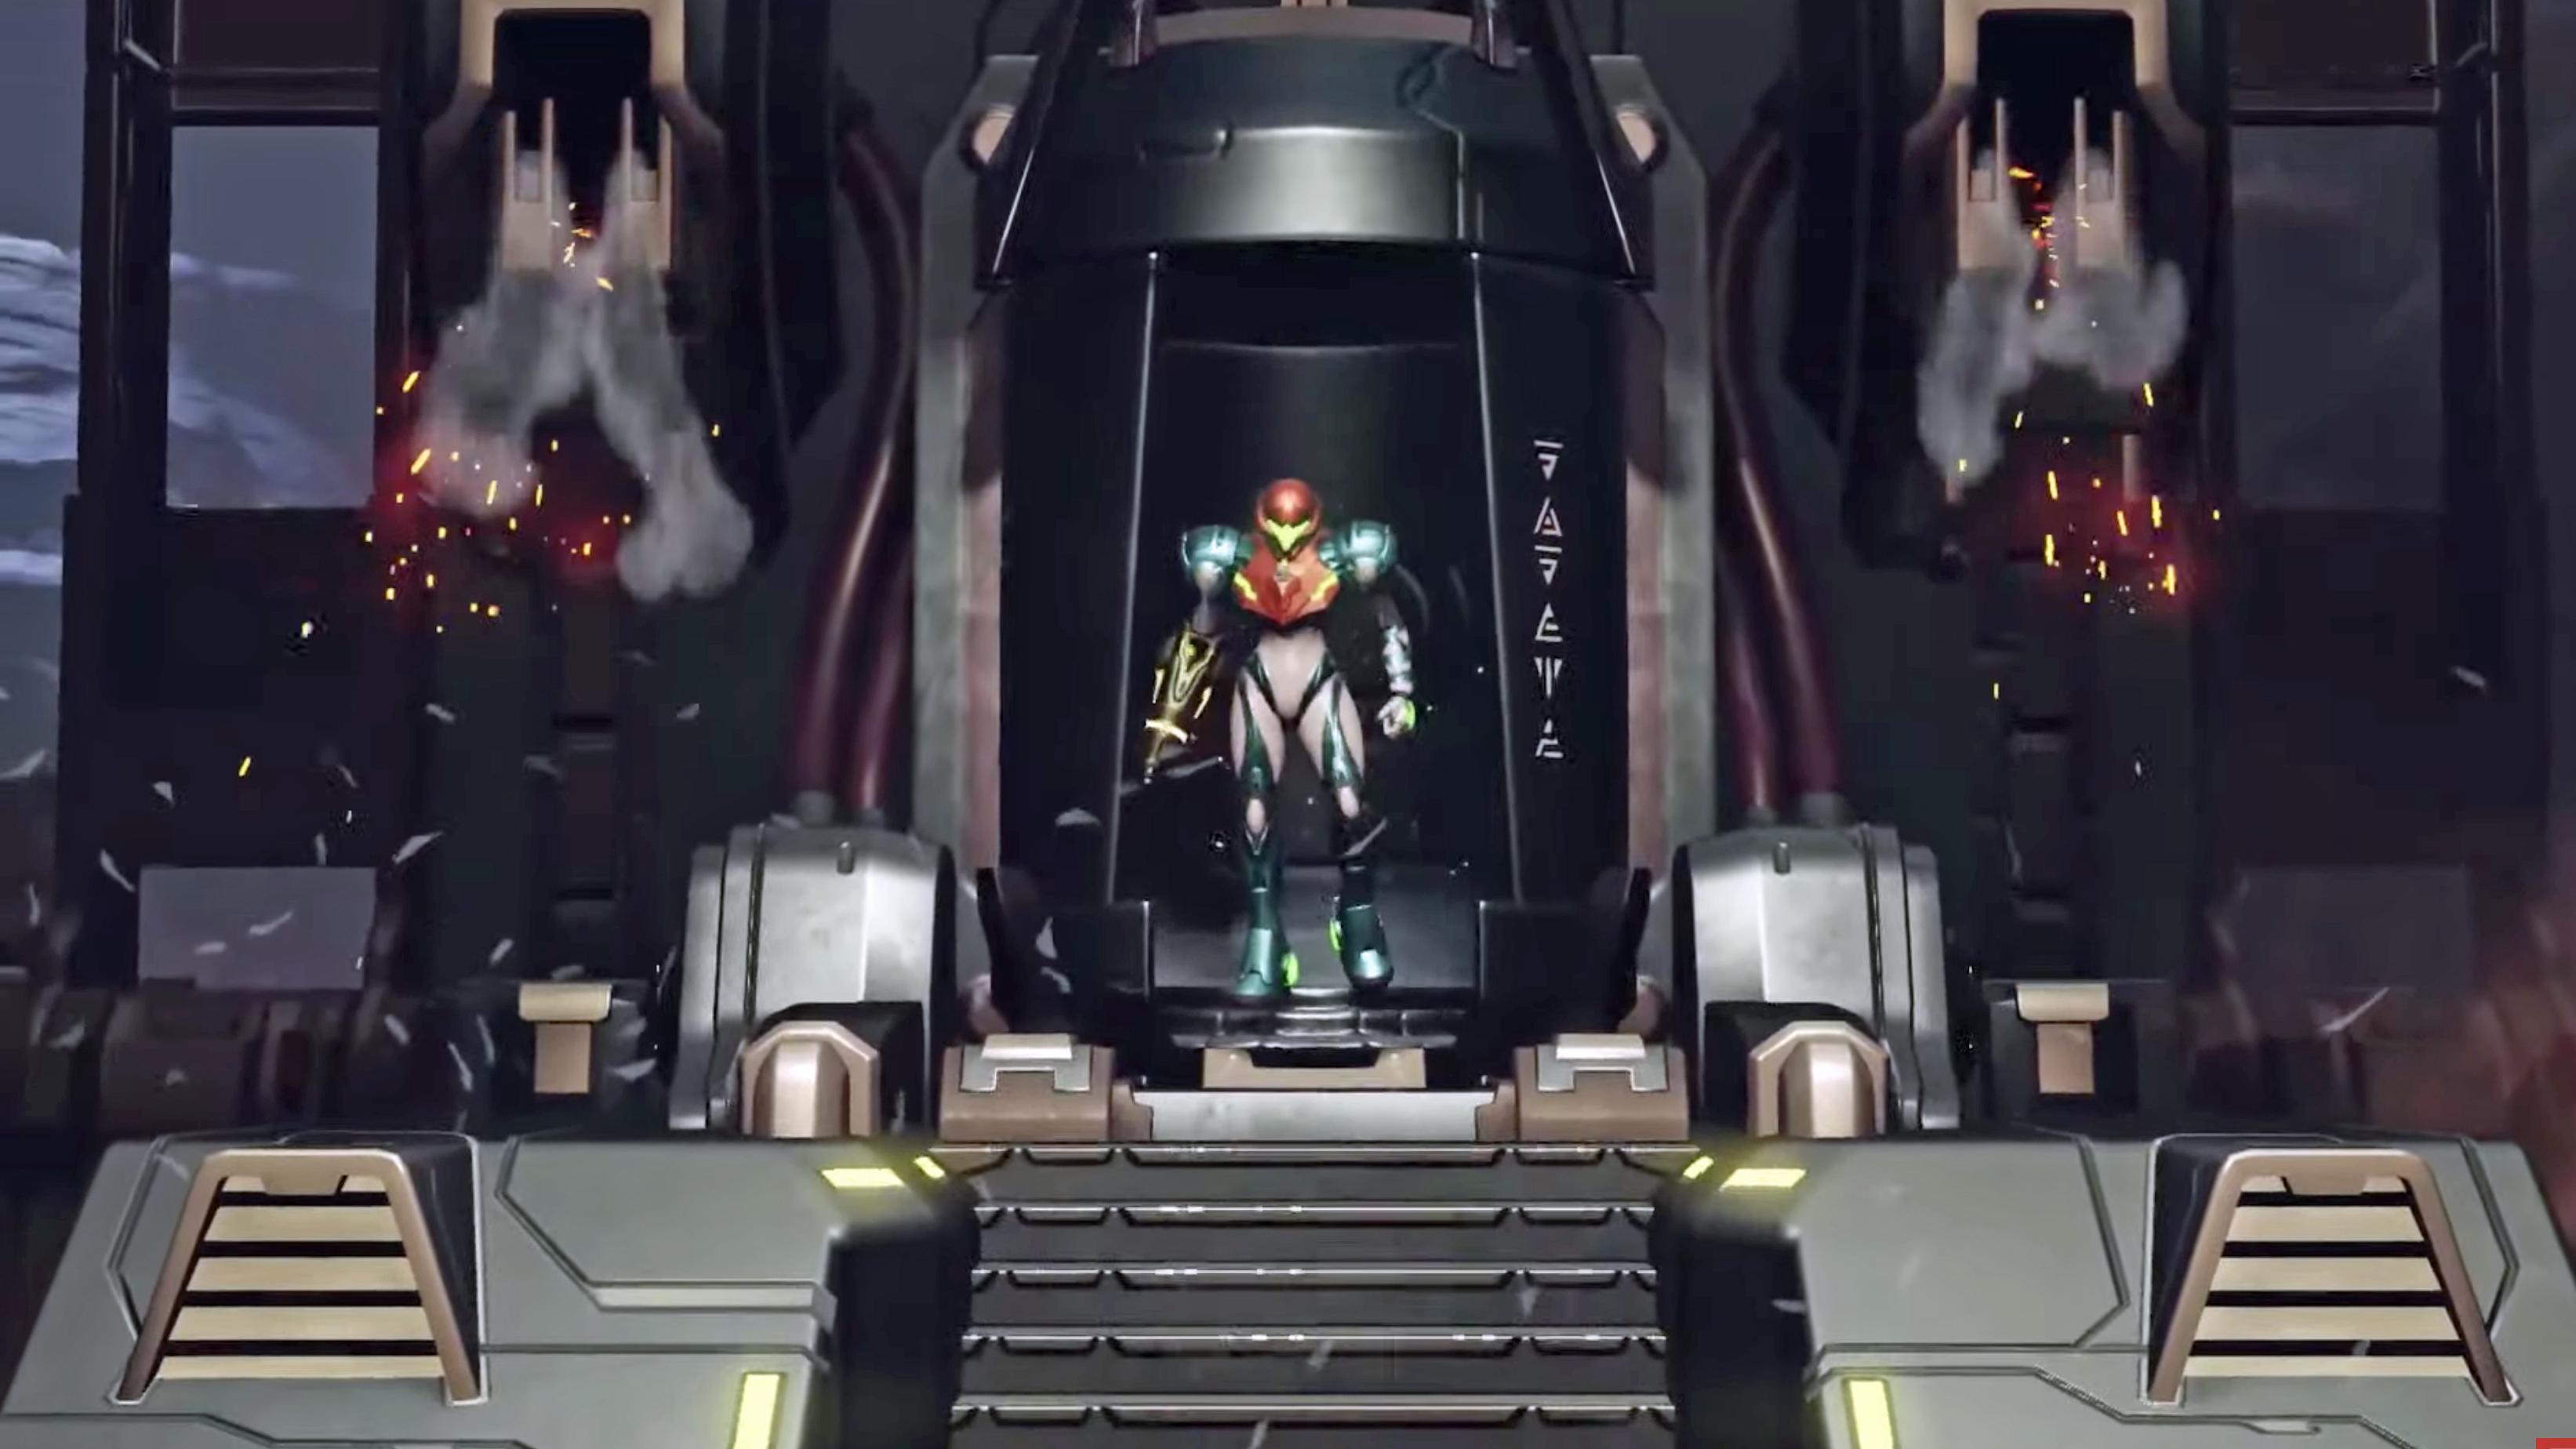 Samus stands ready in Metroid Dread